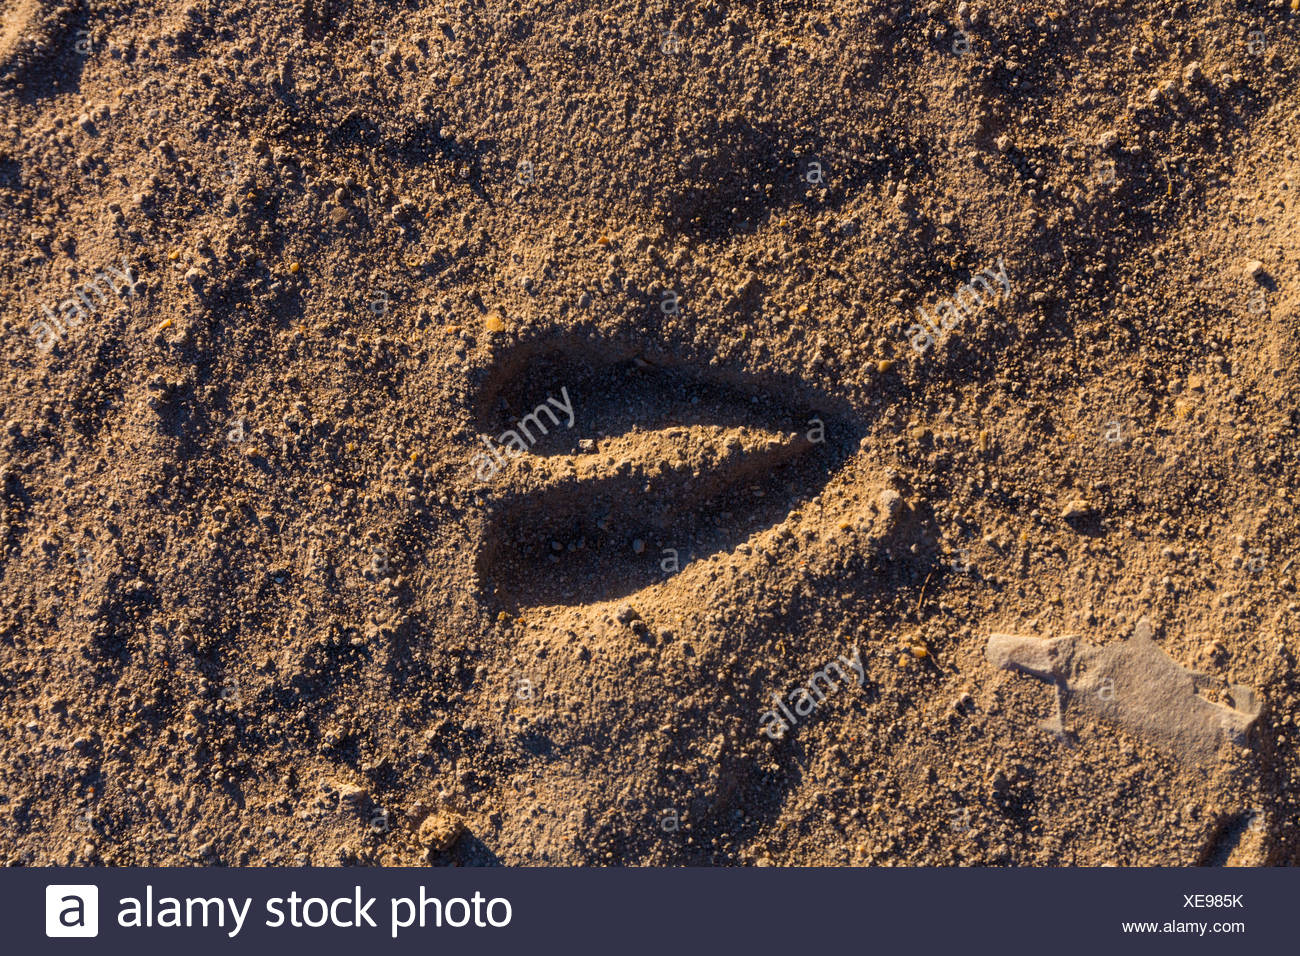 Antelope Trace - Kalahari Botswana - Stock Image